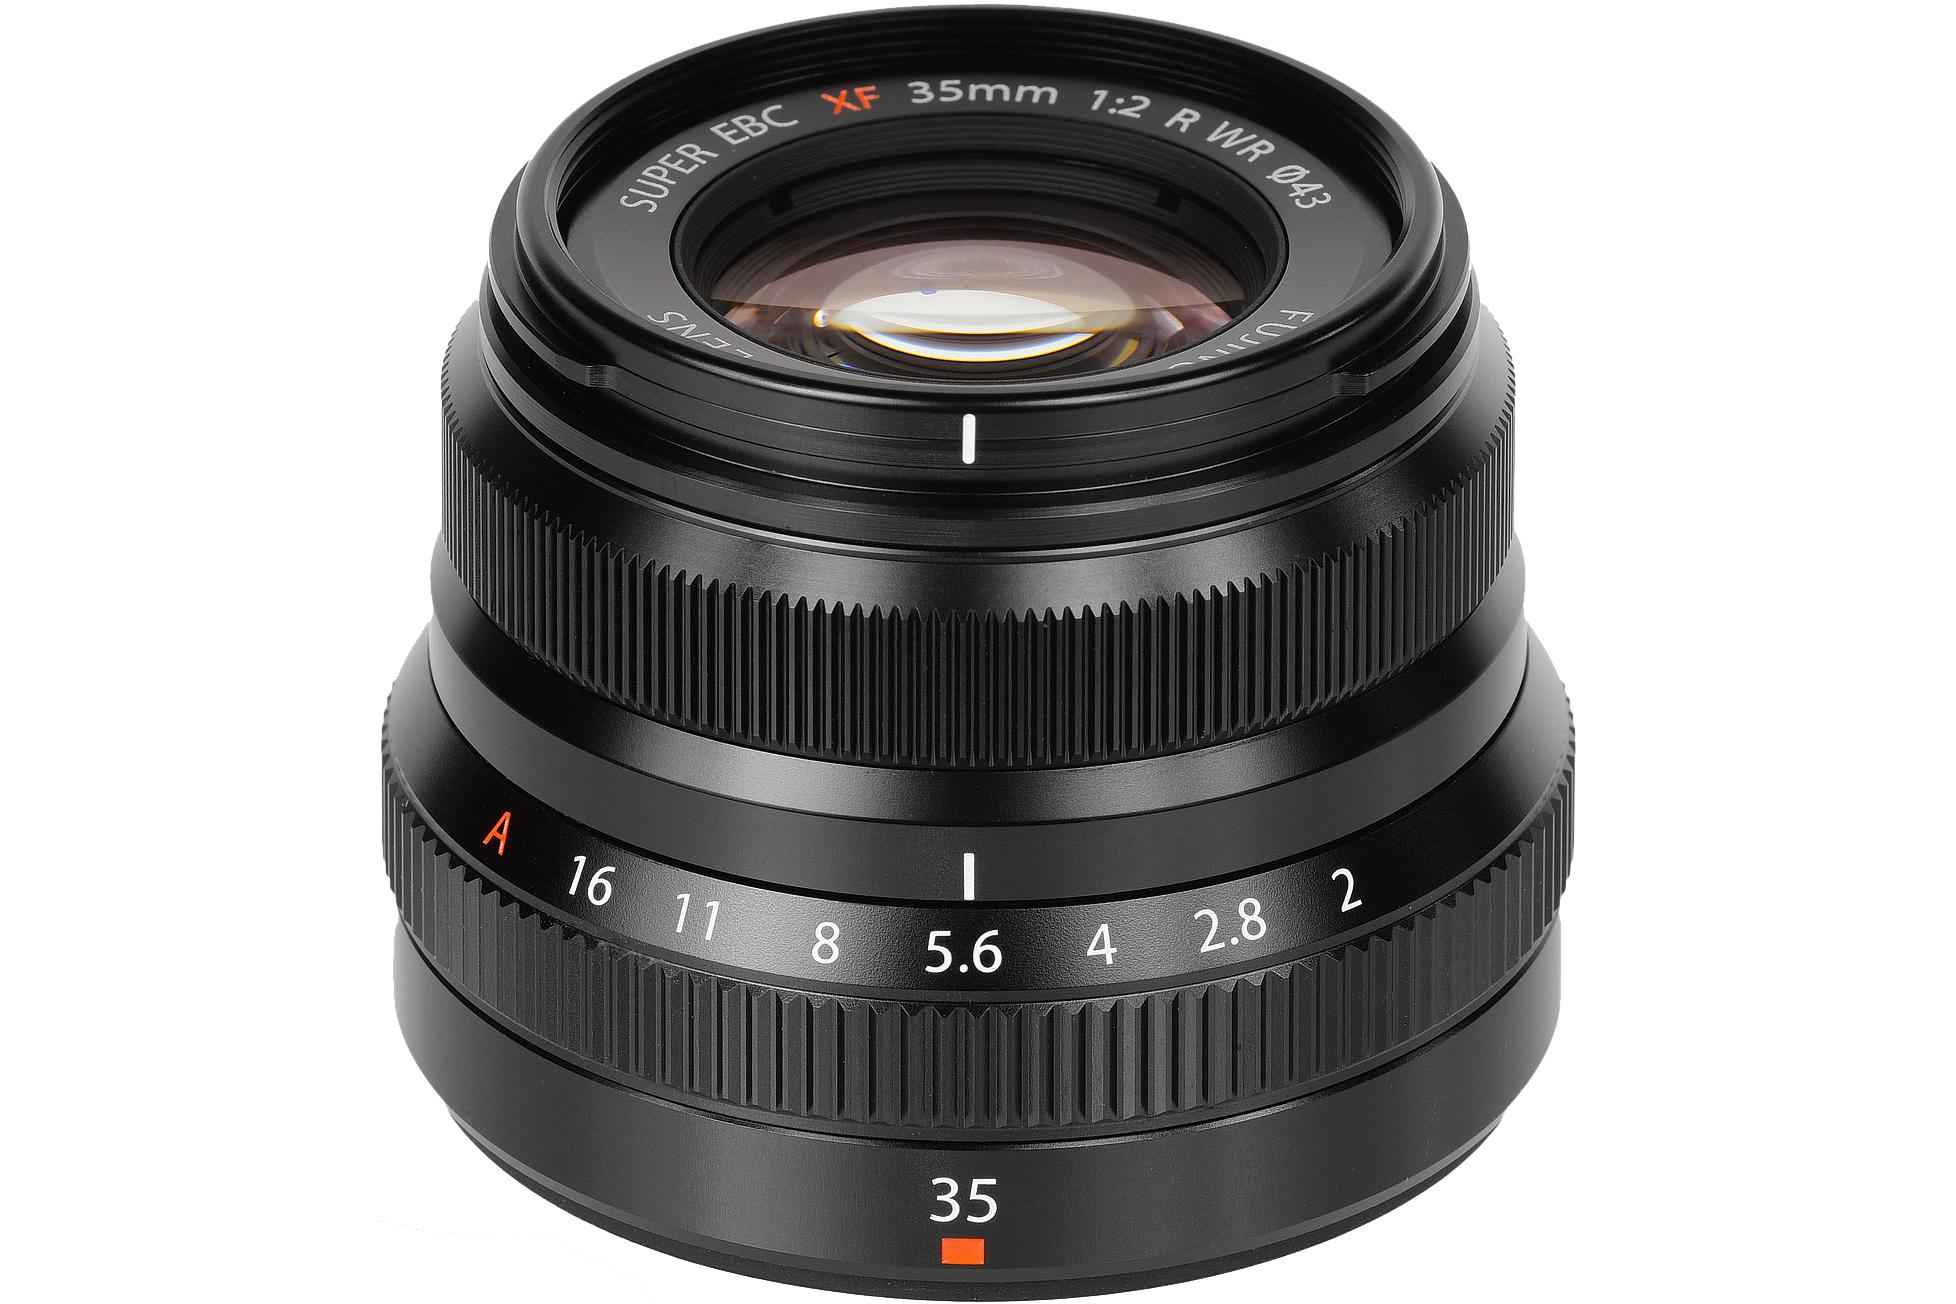 Fujifilm Fuji XF 35mm F2 R WR lens - Black